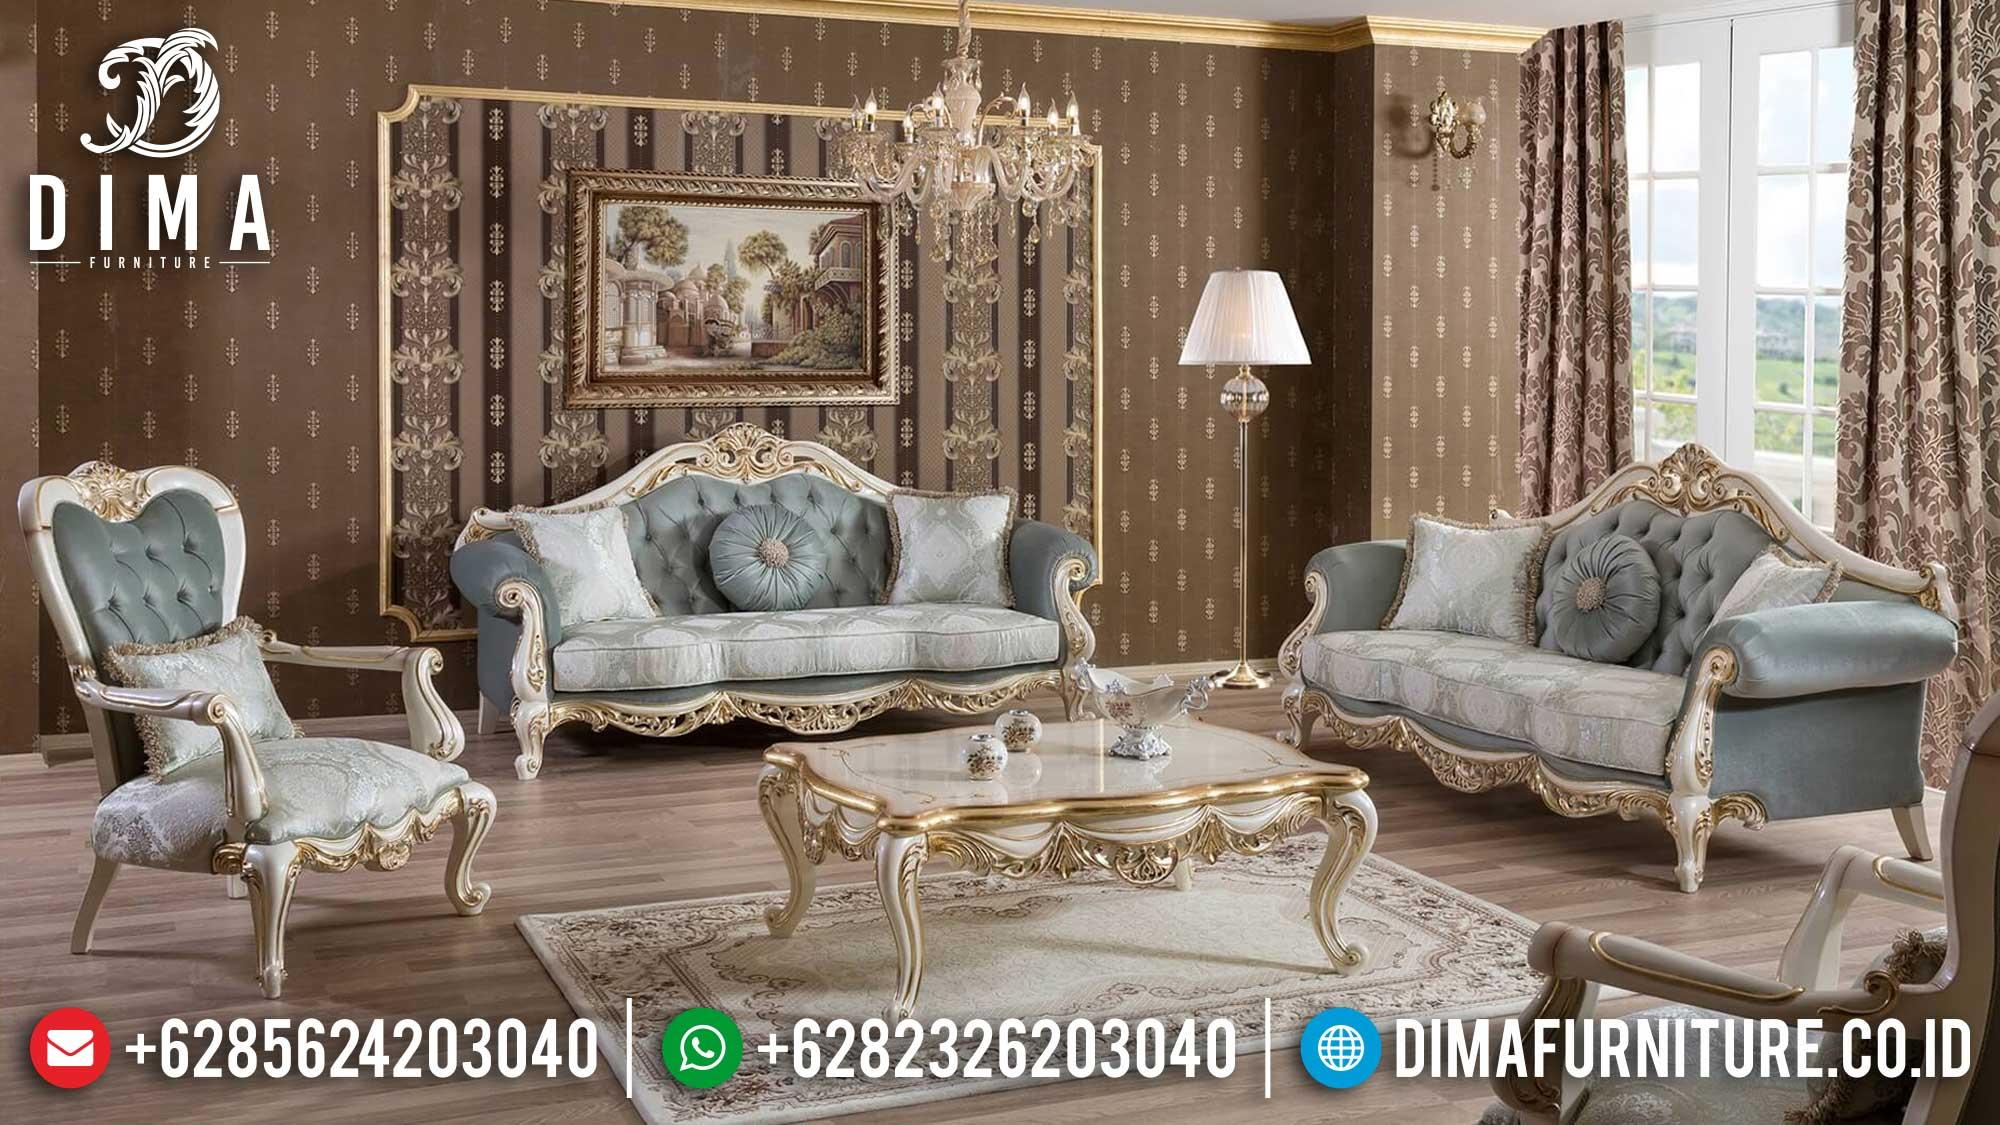 New Set Sofa Tamu Jepara Ukiran Gold Prada Seri Yeni Df-1470